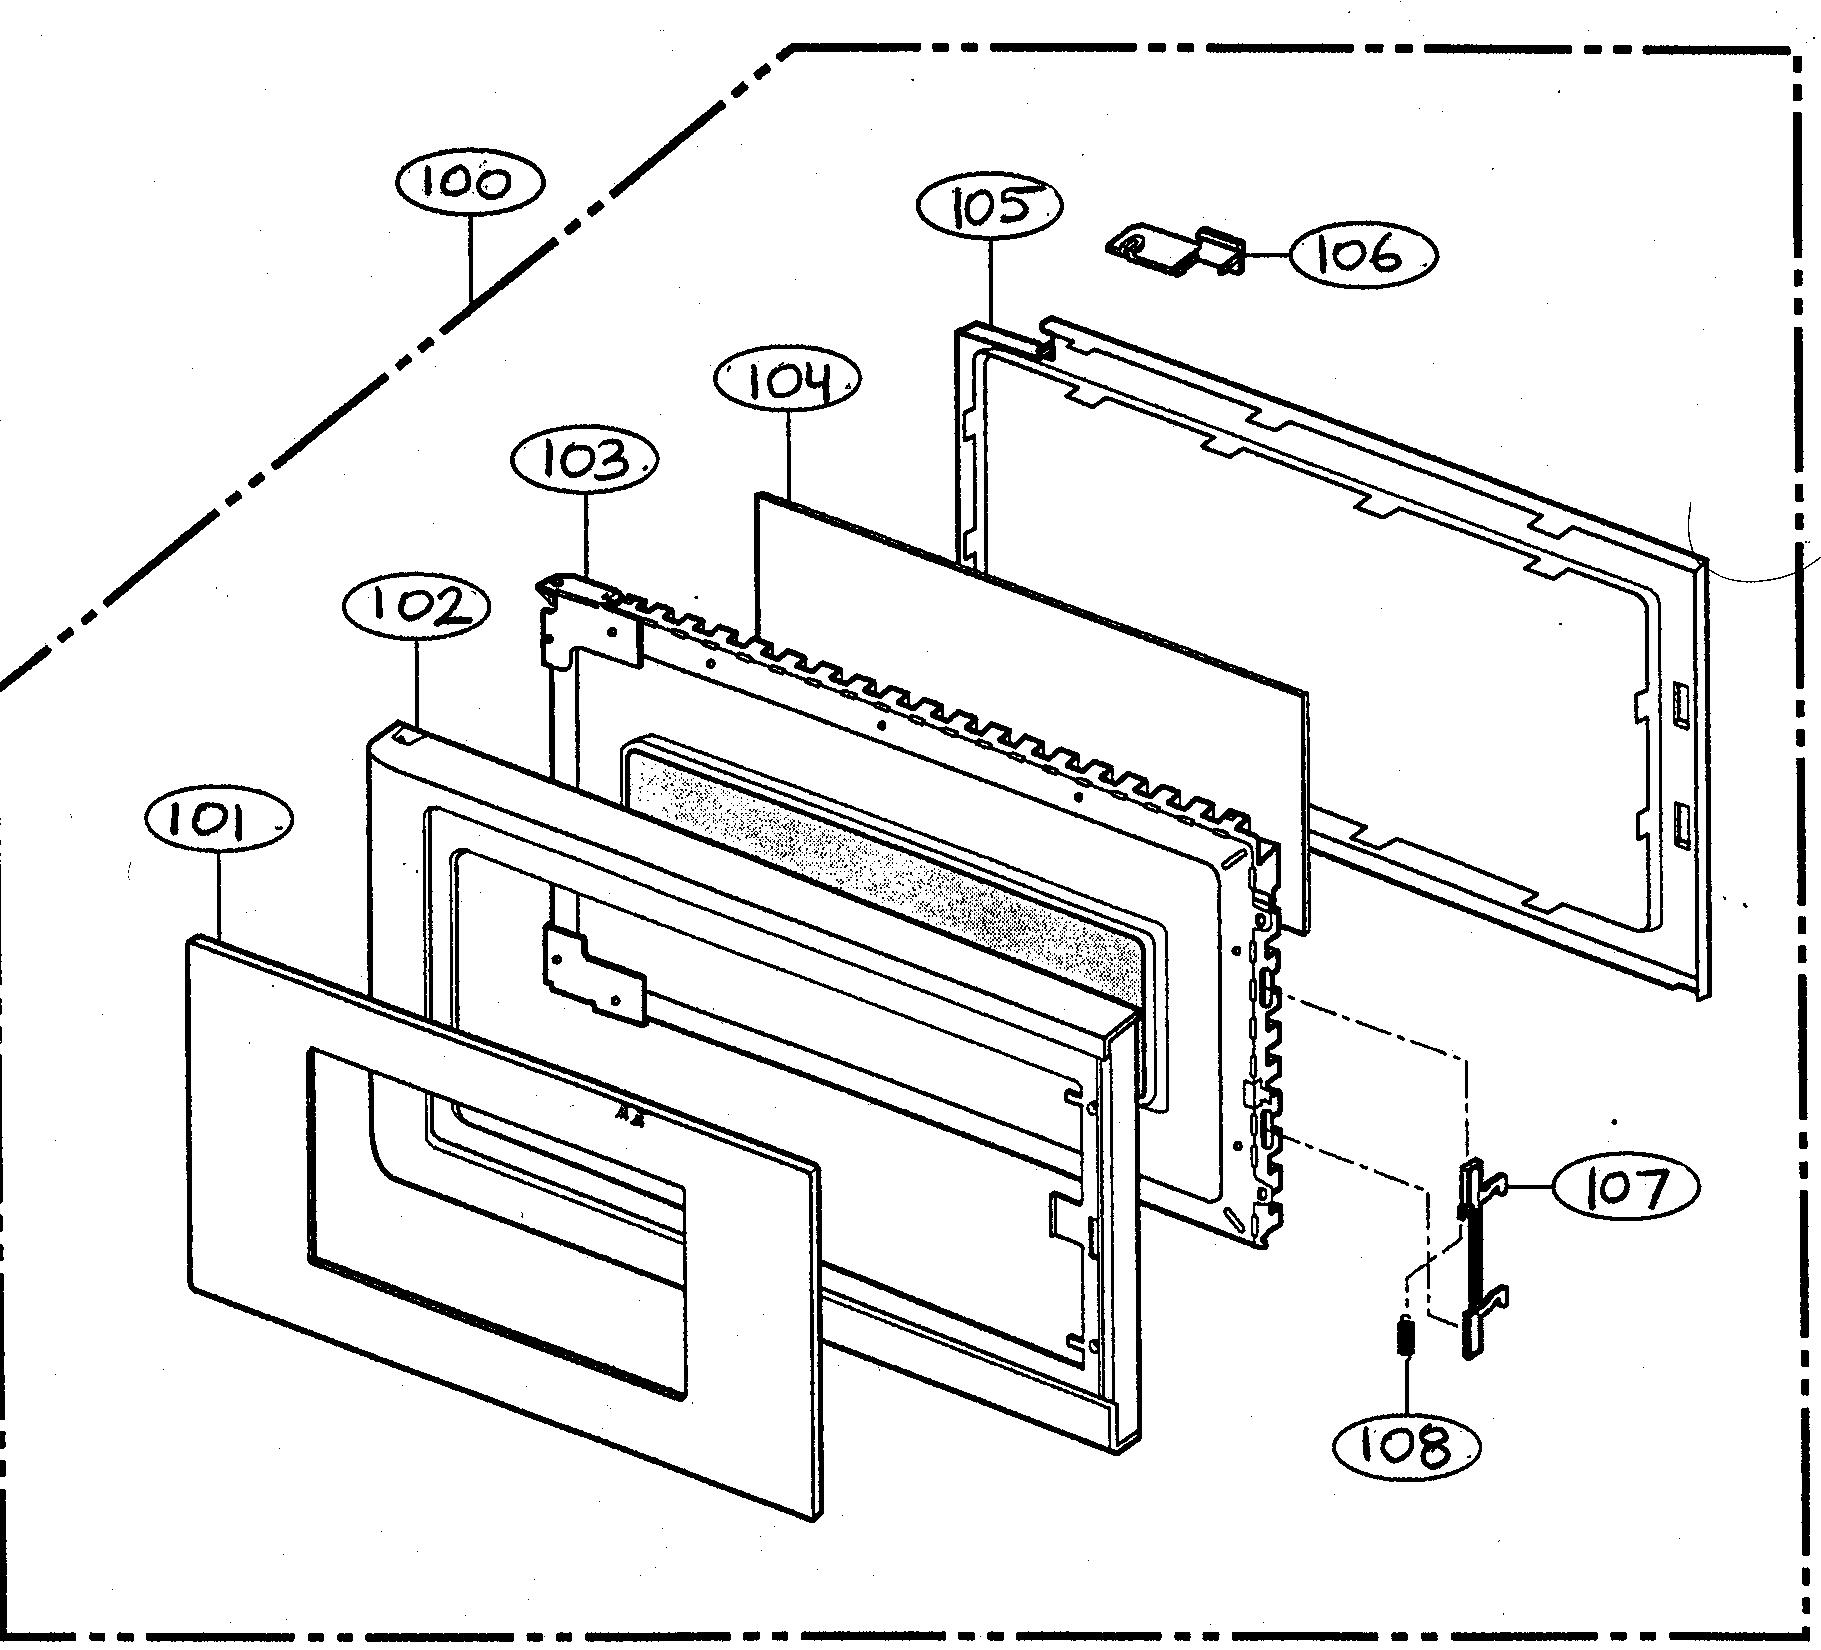 Goldstar model MV-1304W microwave/hood combo genuine parts